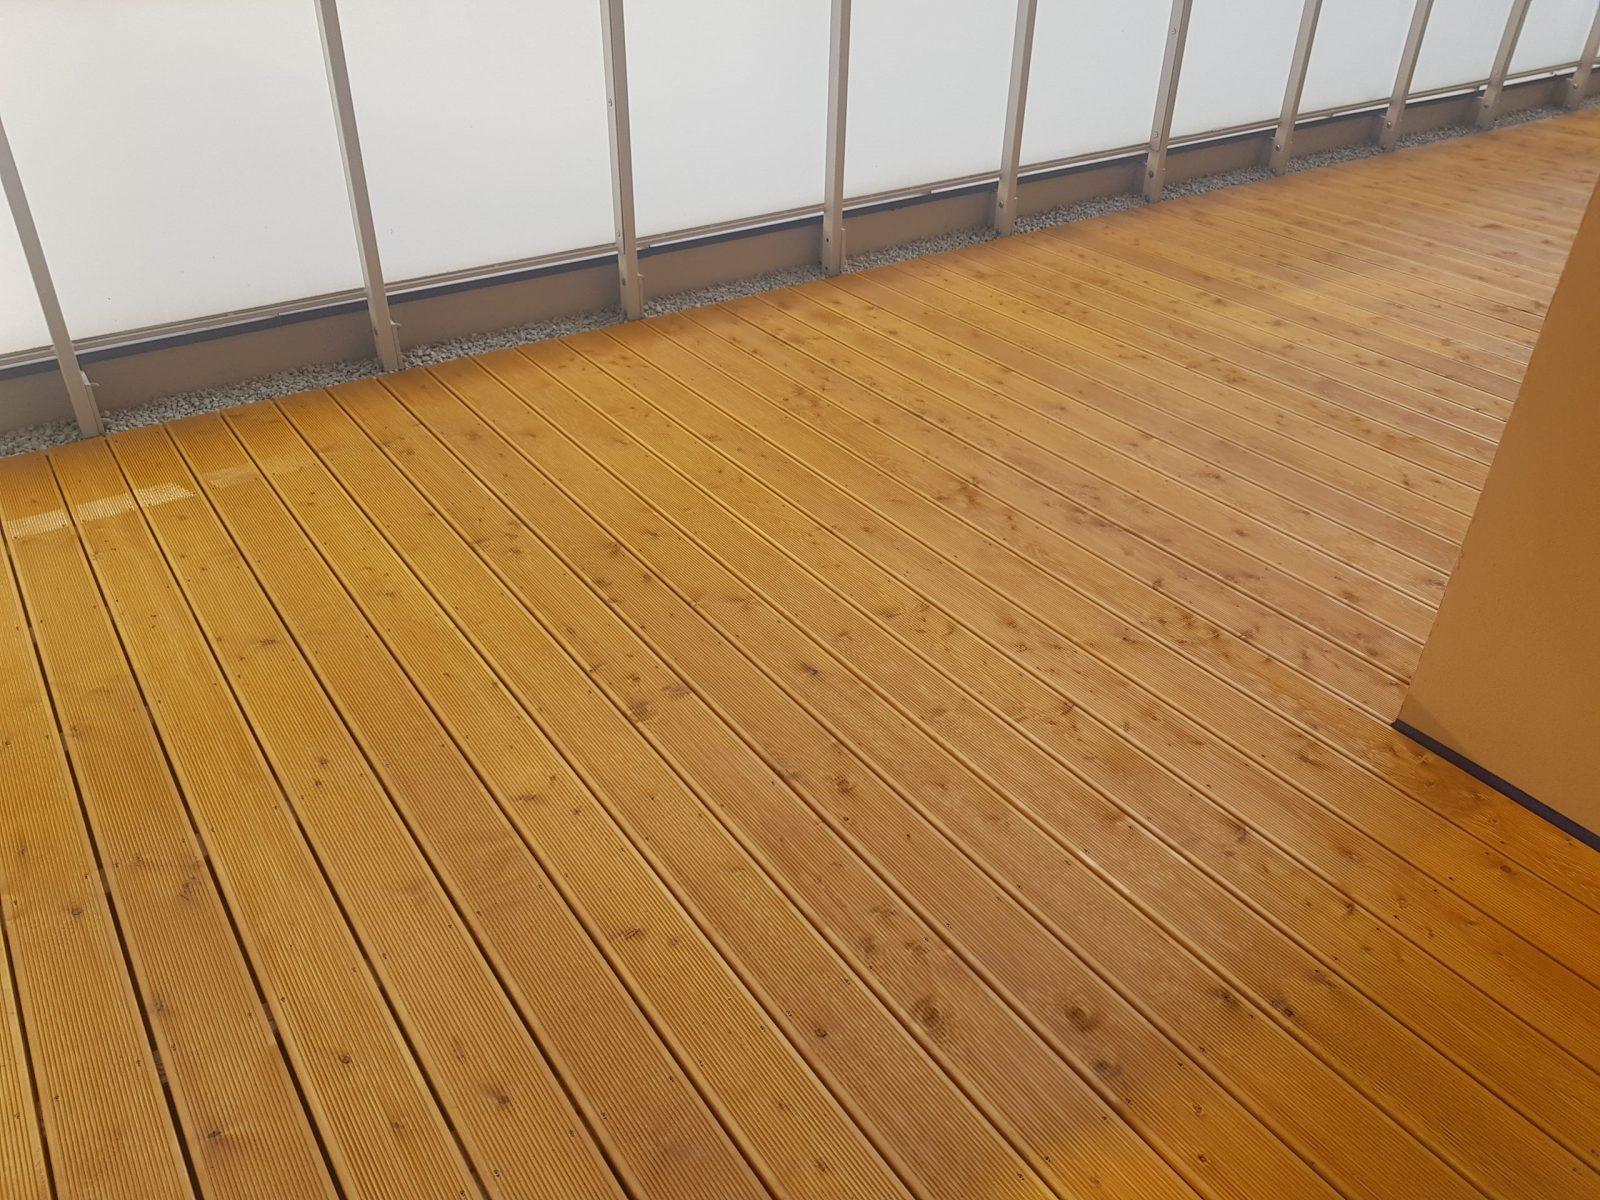 Deska tarasowa pomalowana